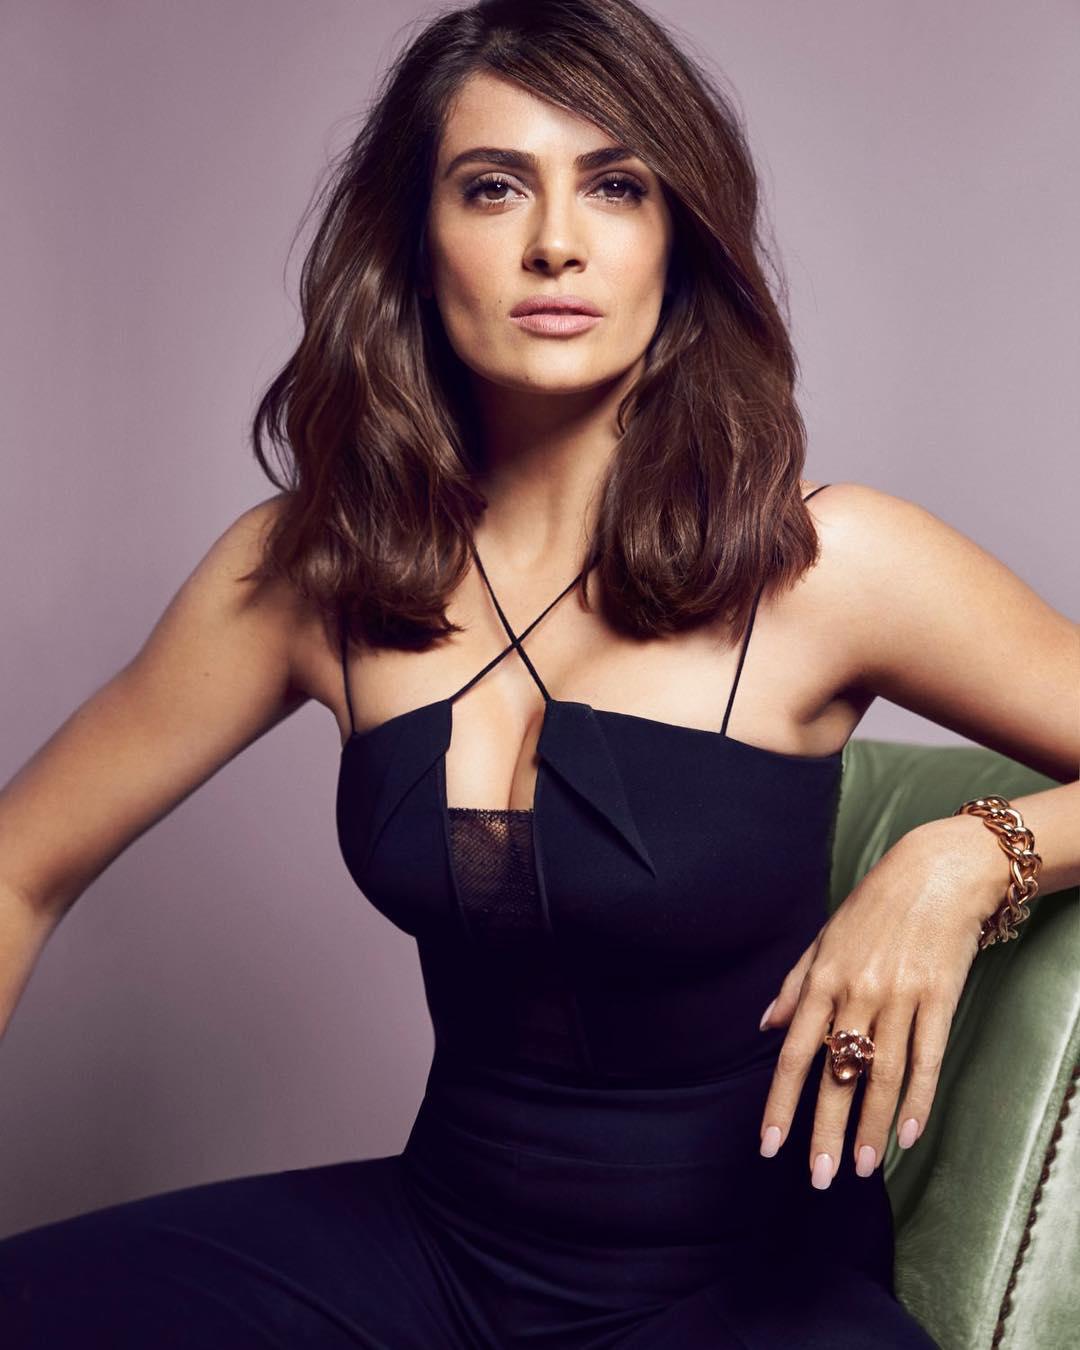 Hollywood Actress - Bold Pictures - Salma Hayek